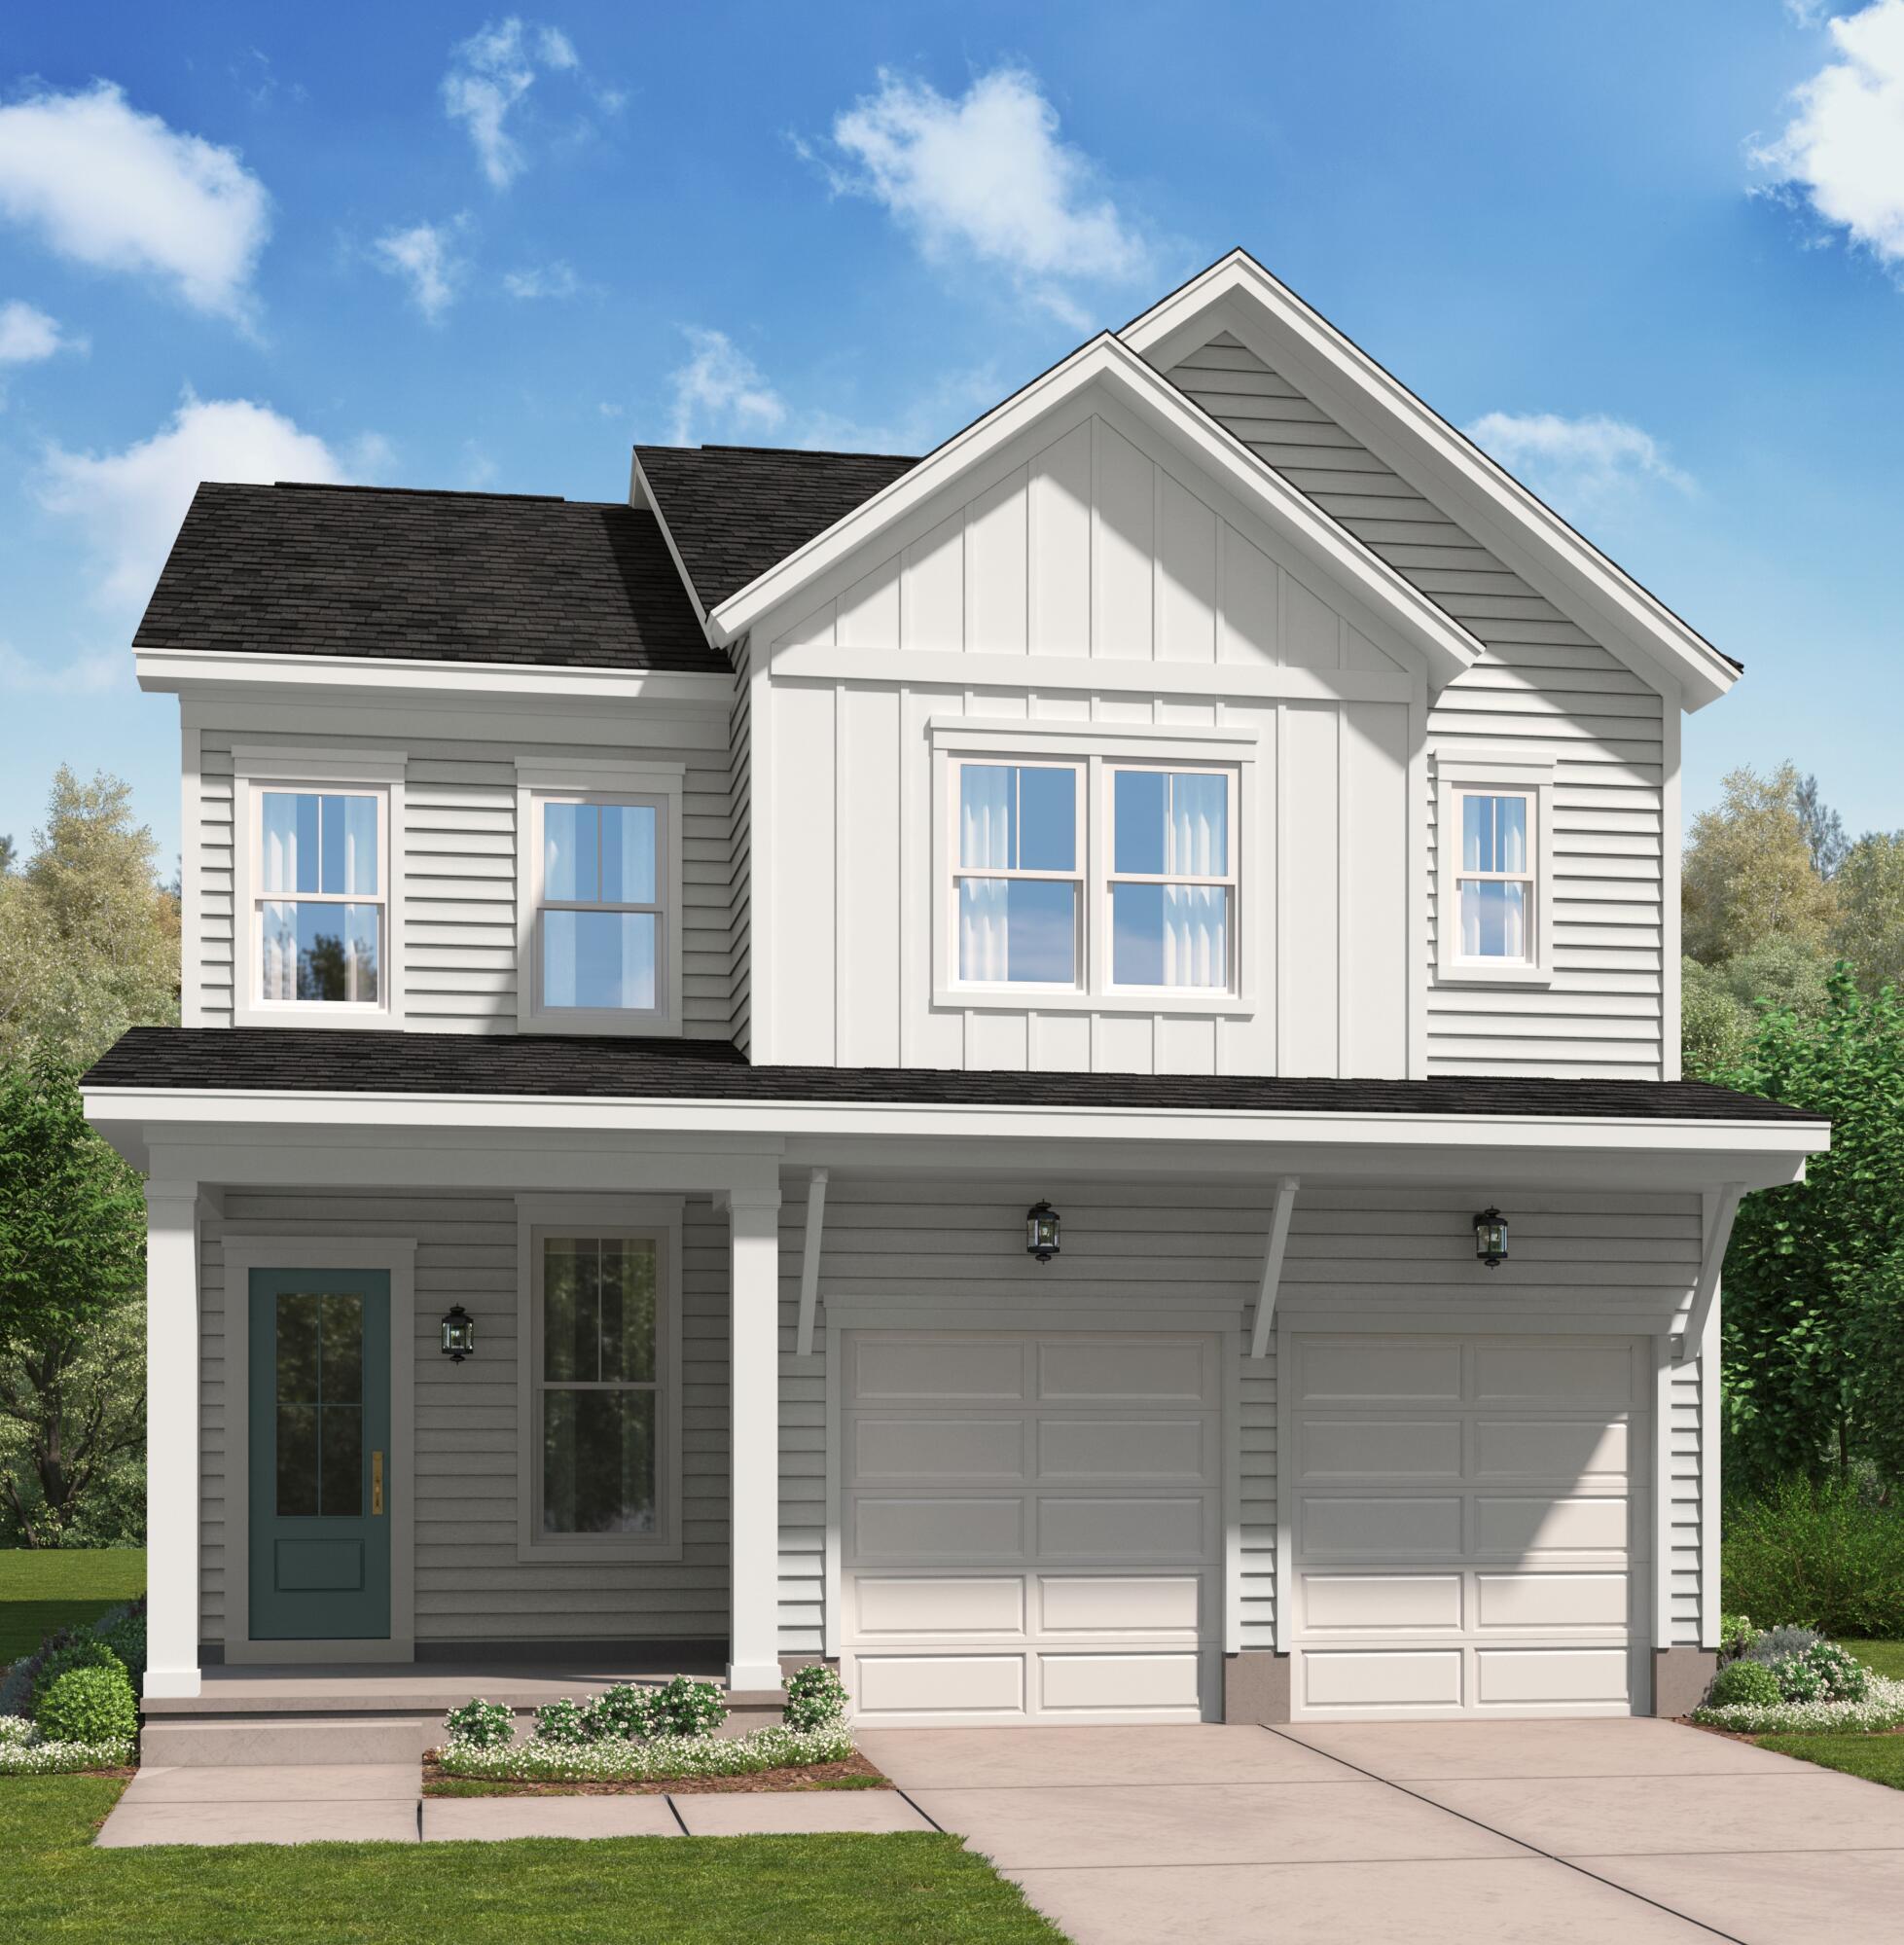 Fulton Park Homes For Sale - 1264 Max, Mount Pleasant, SC - 14